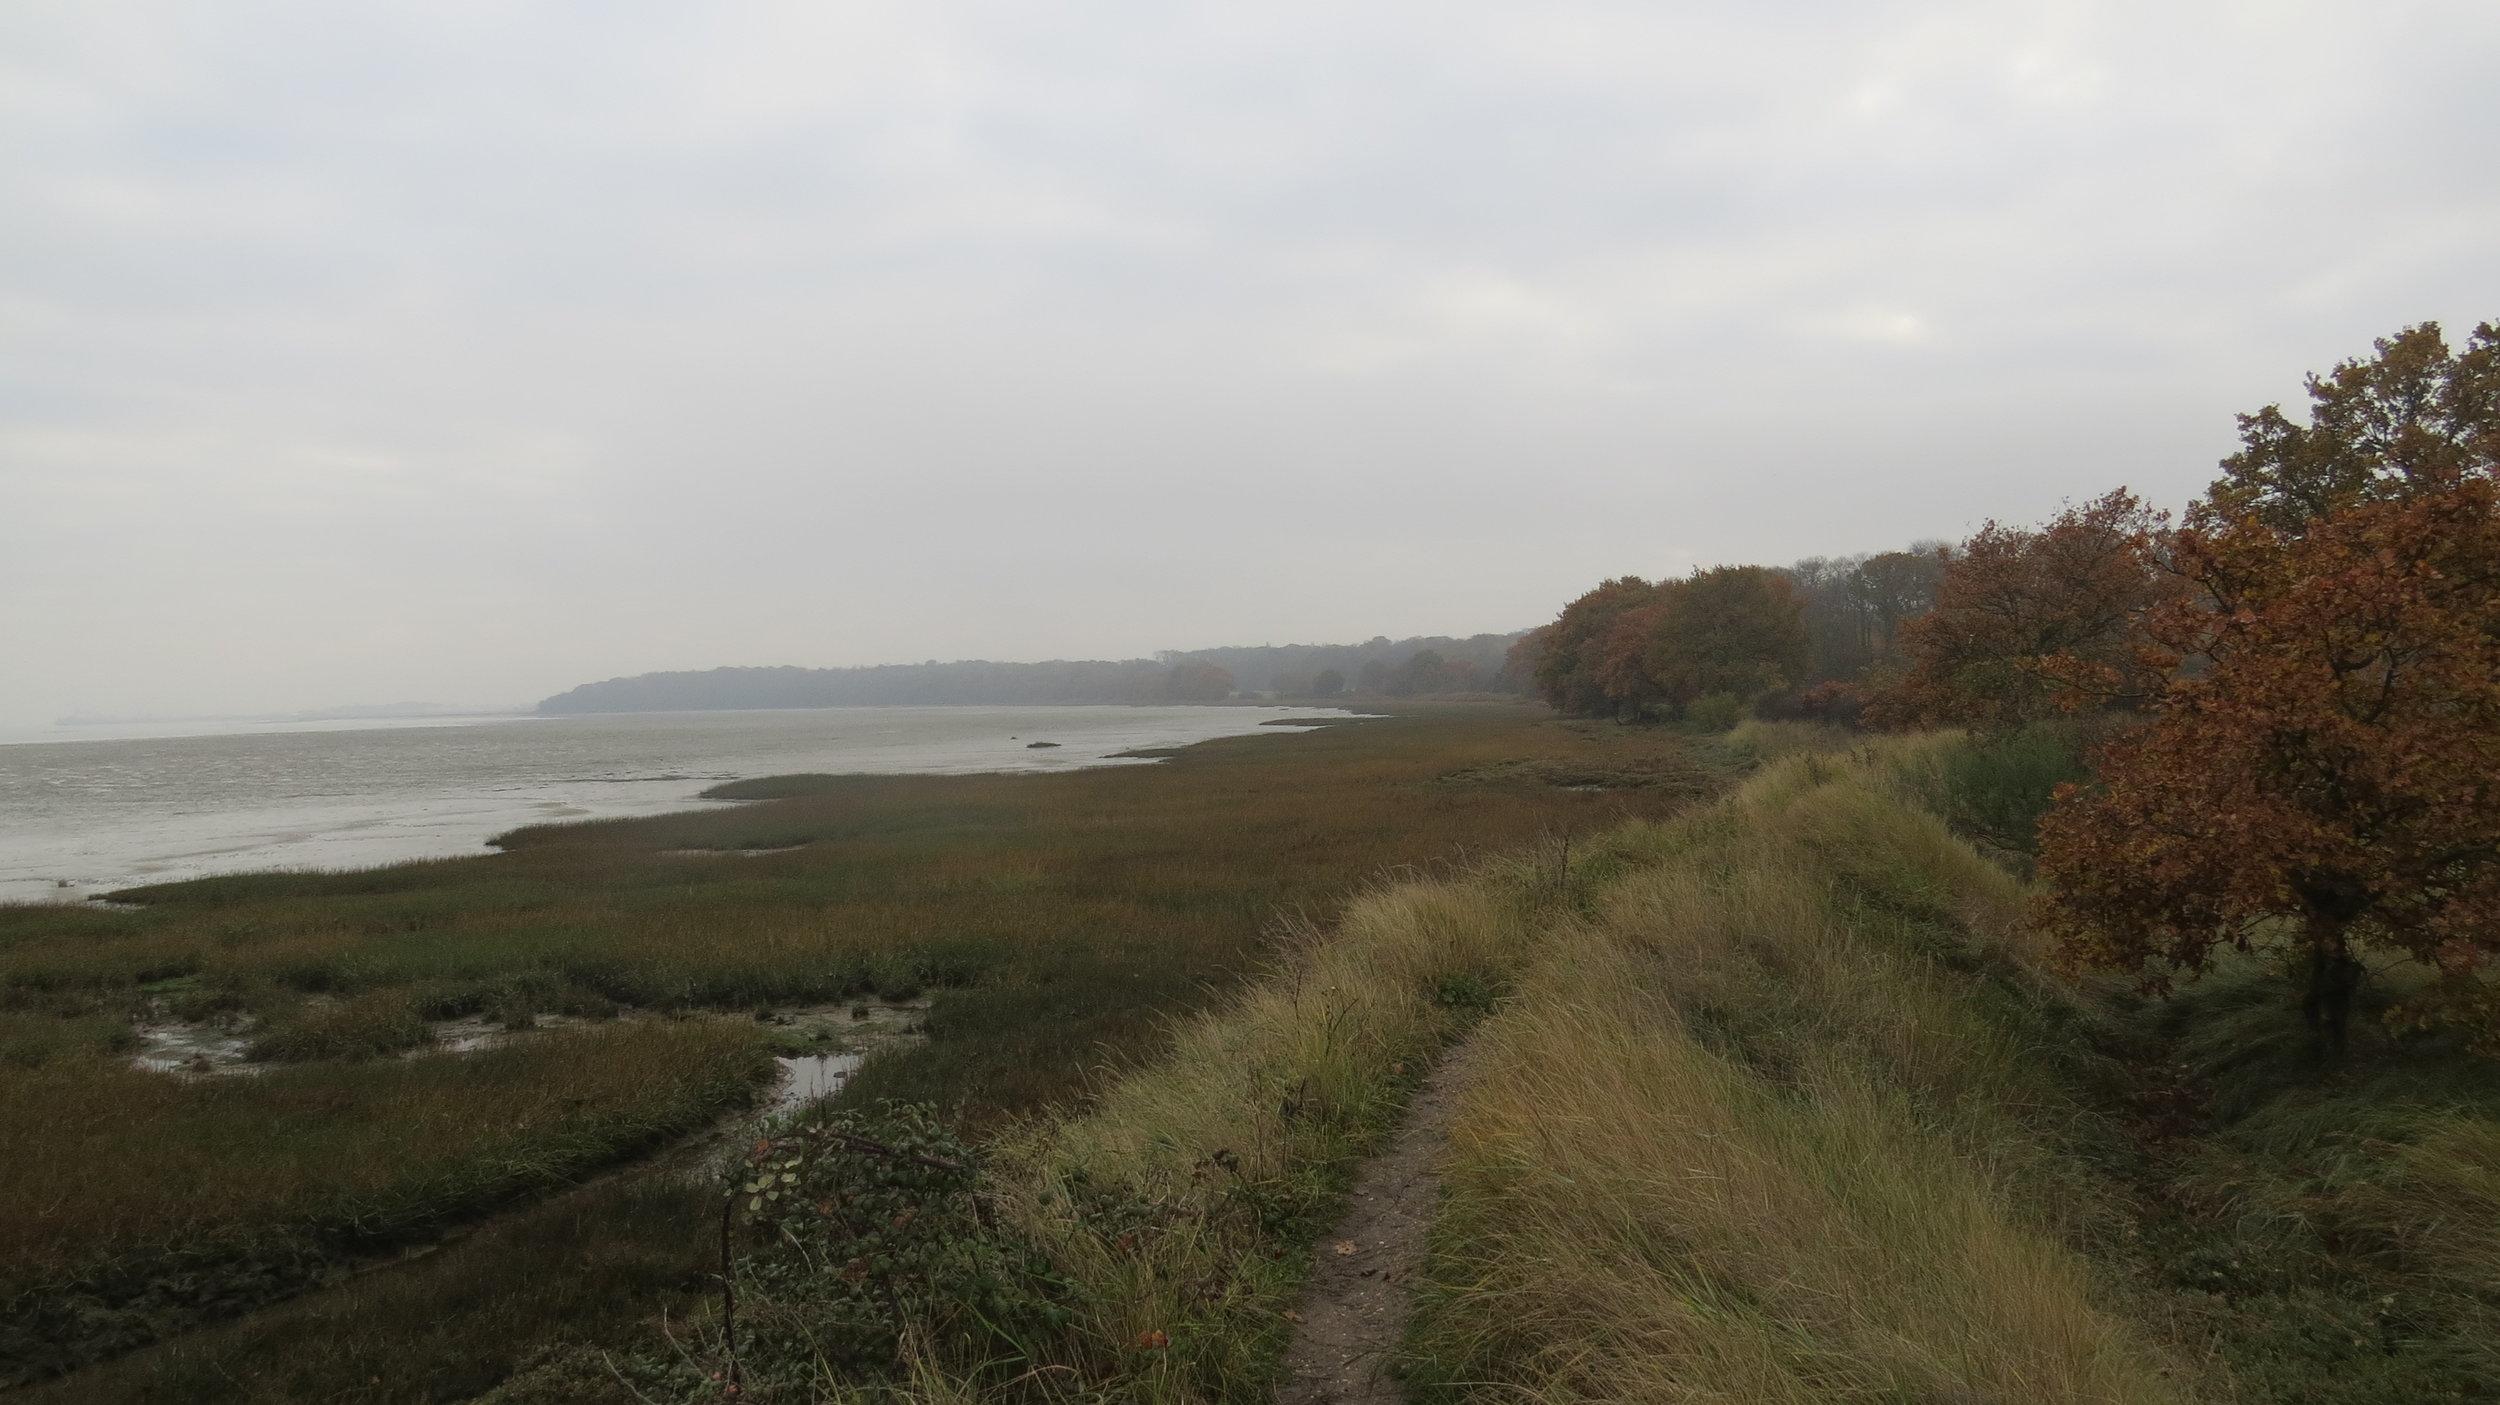 Embankment near Wrabness